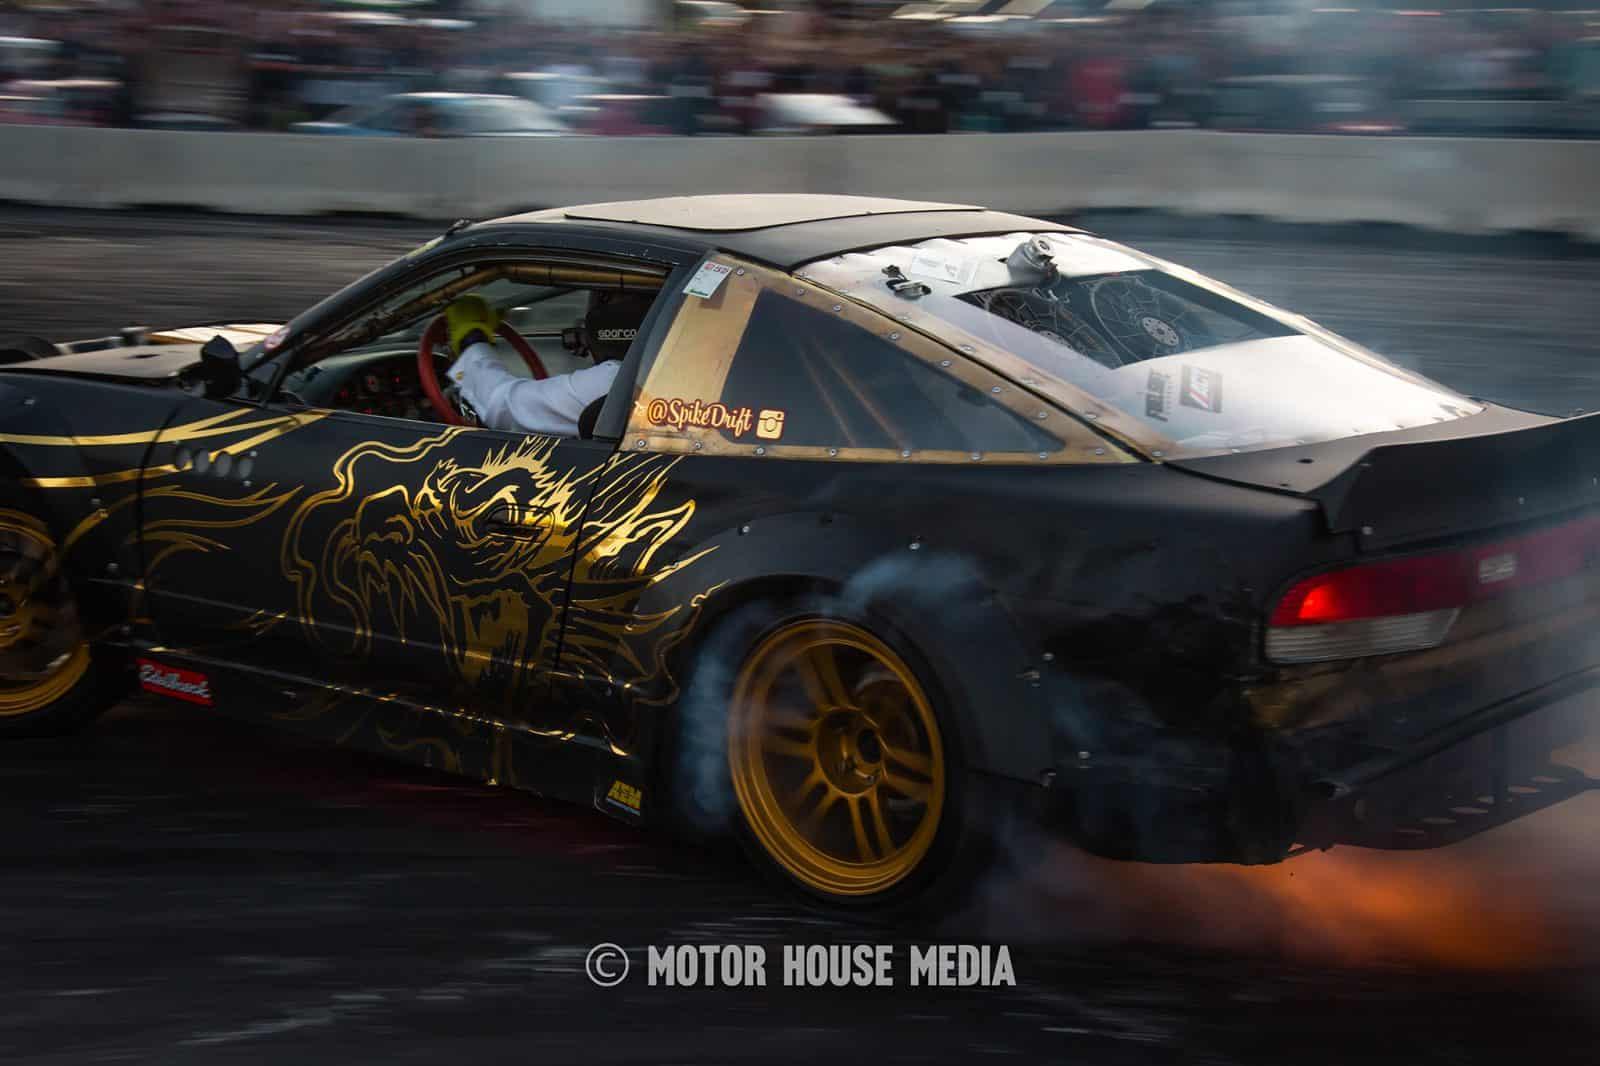 Spike Chen's loud Supra drifting at Hoonigan's Sema Burnyard